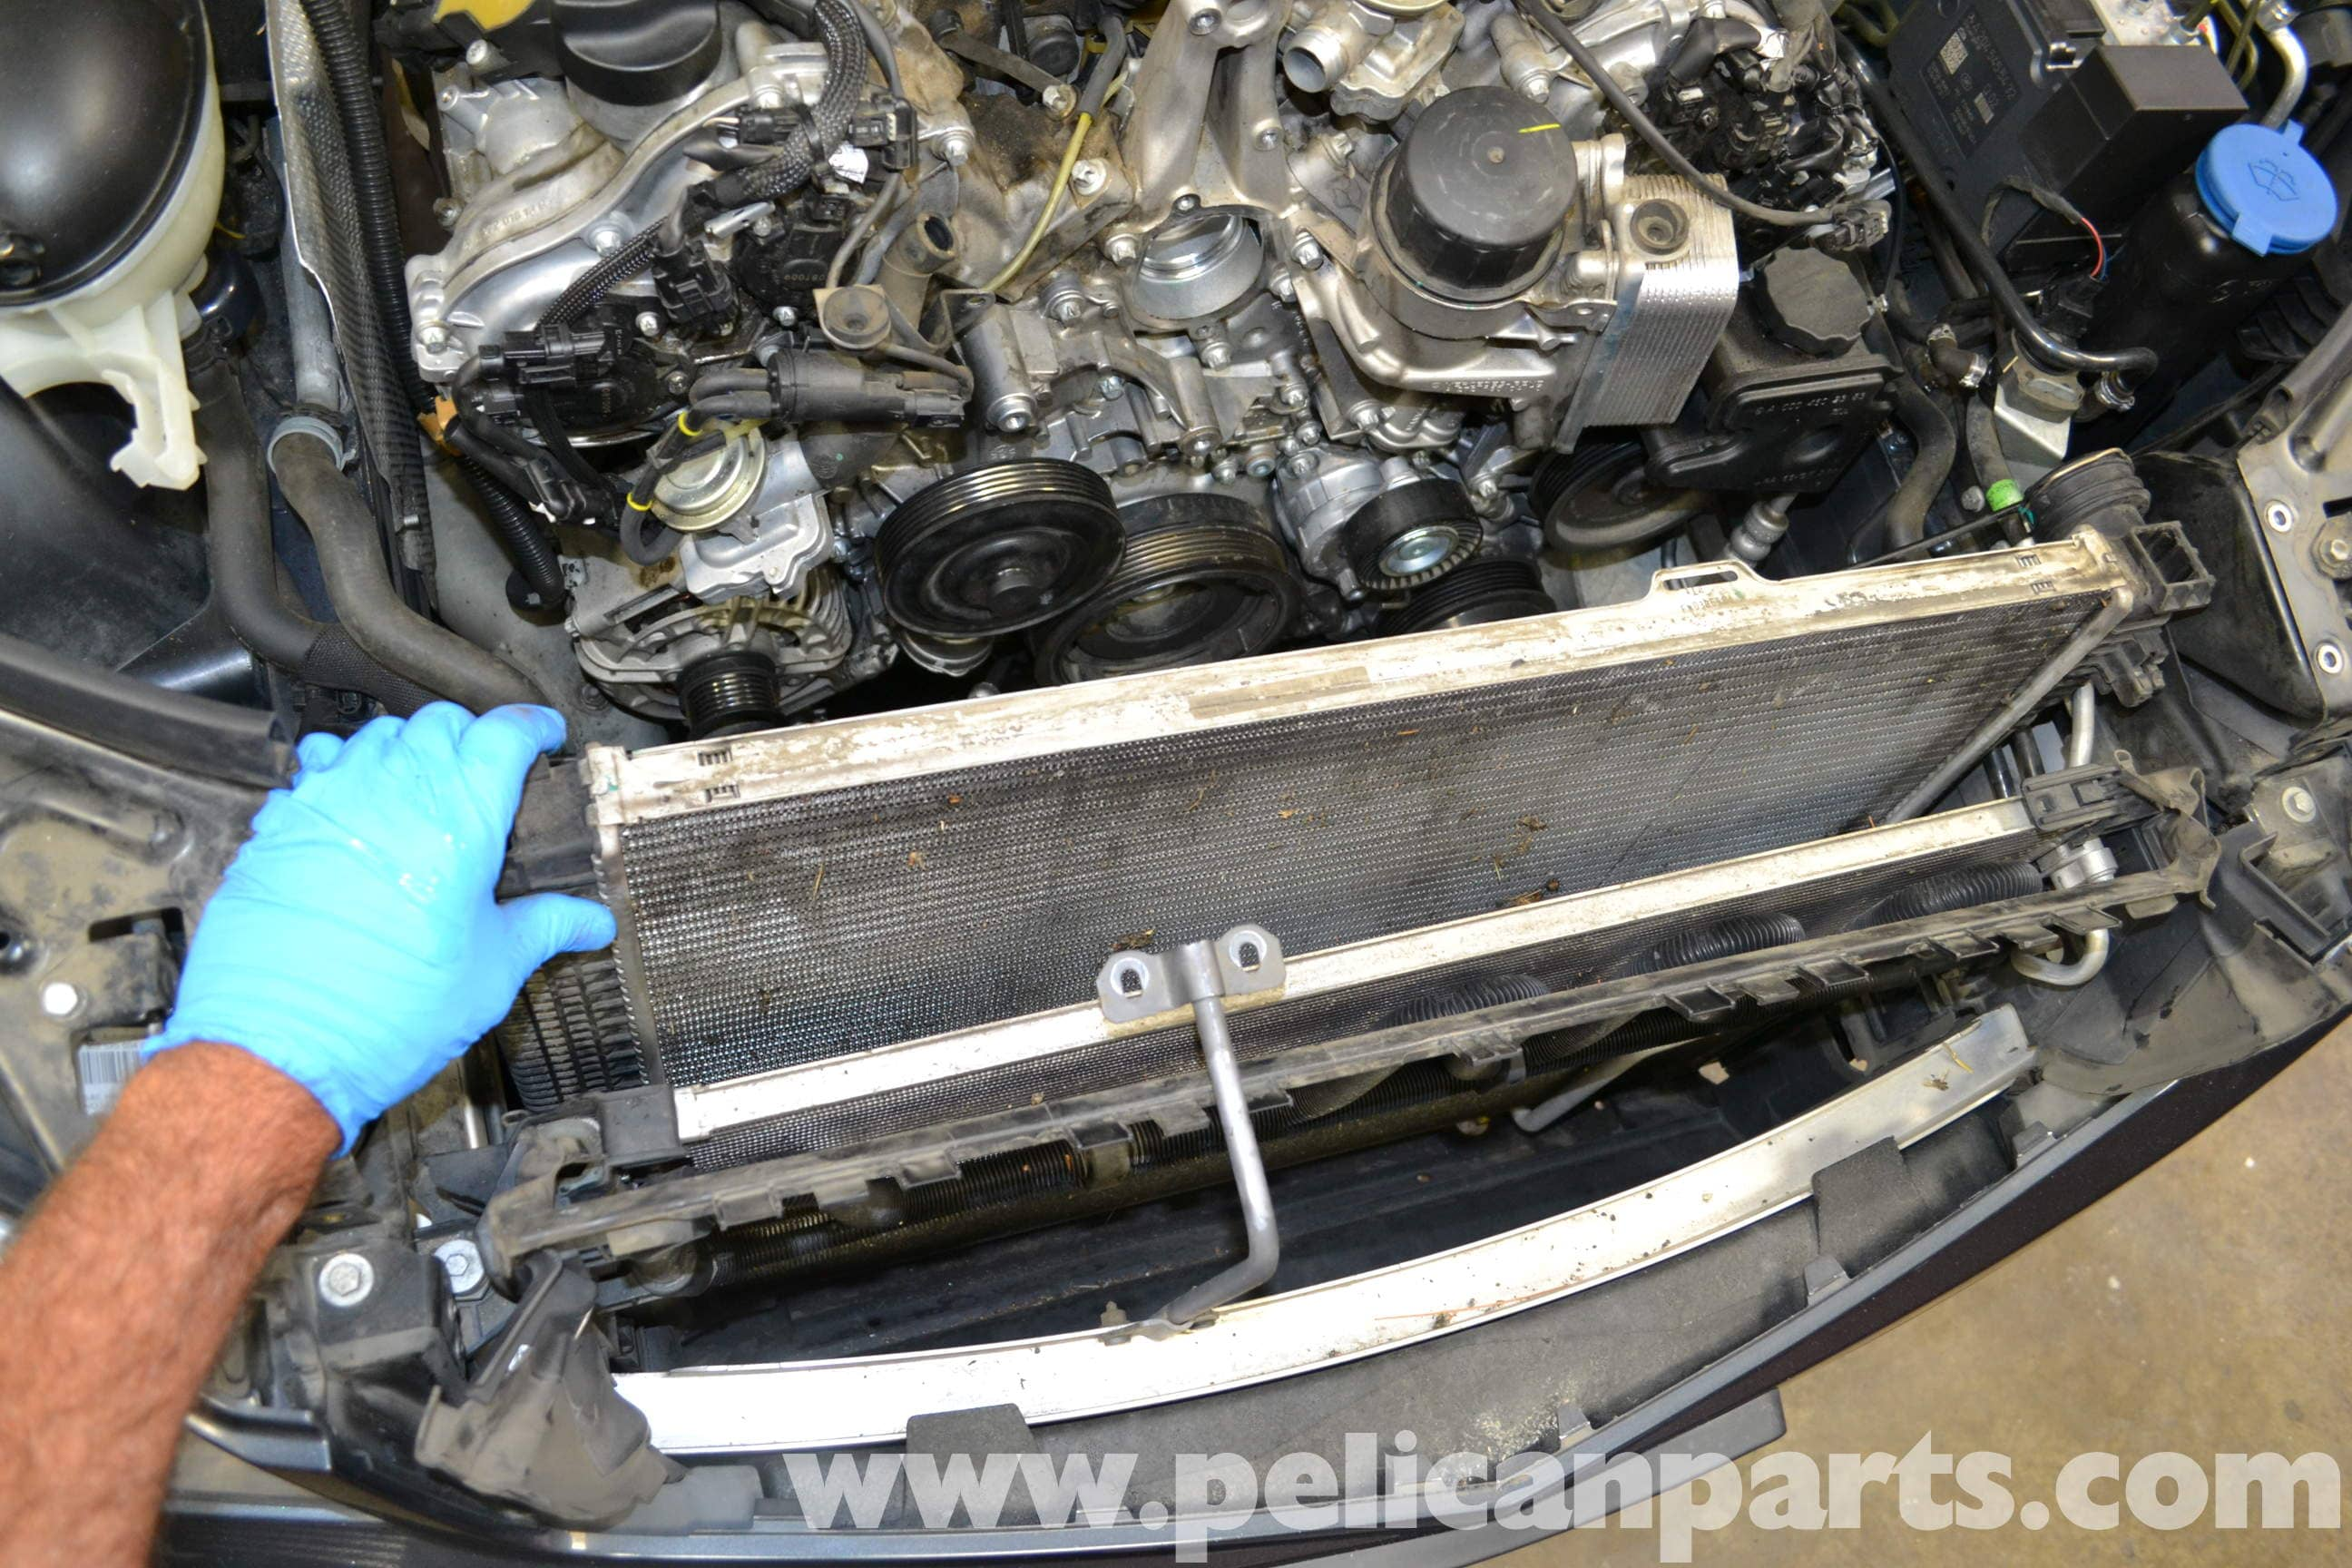 Mercedes Benz W204 Radiator Replacement 2008 2014 C250